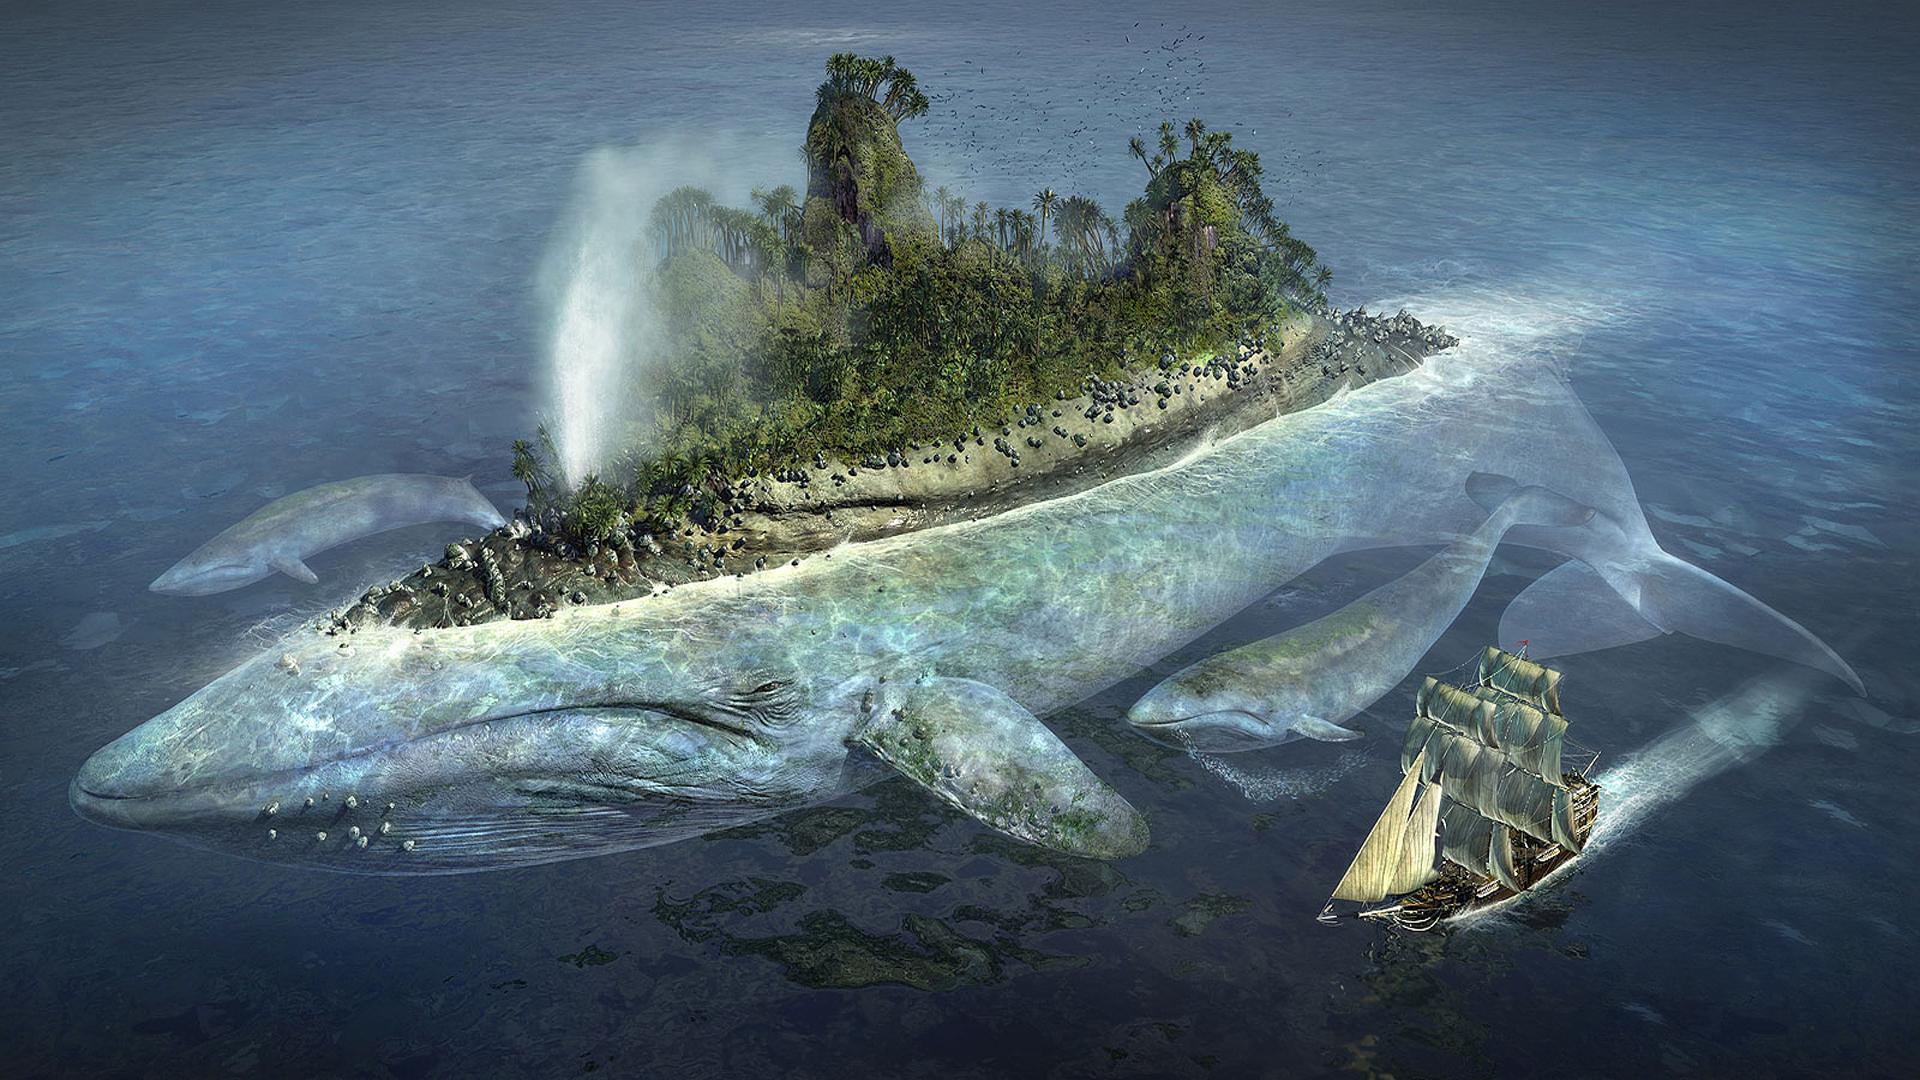 Island Wallpapers, Whale Island Myspace Backgrounds, Whale Island ...